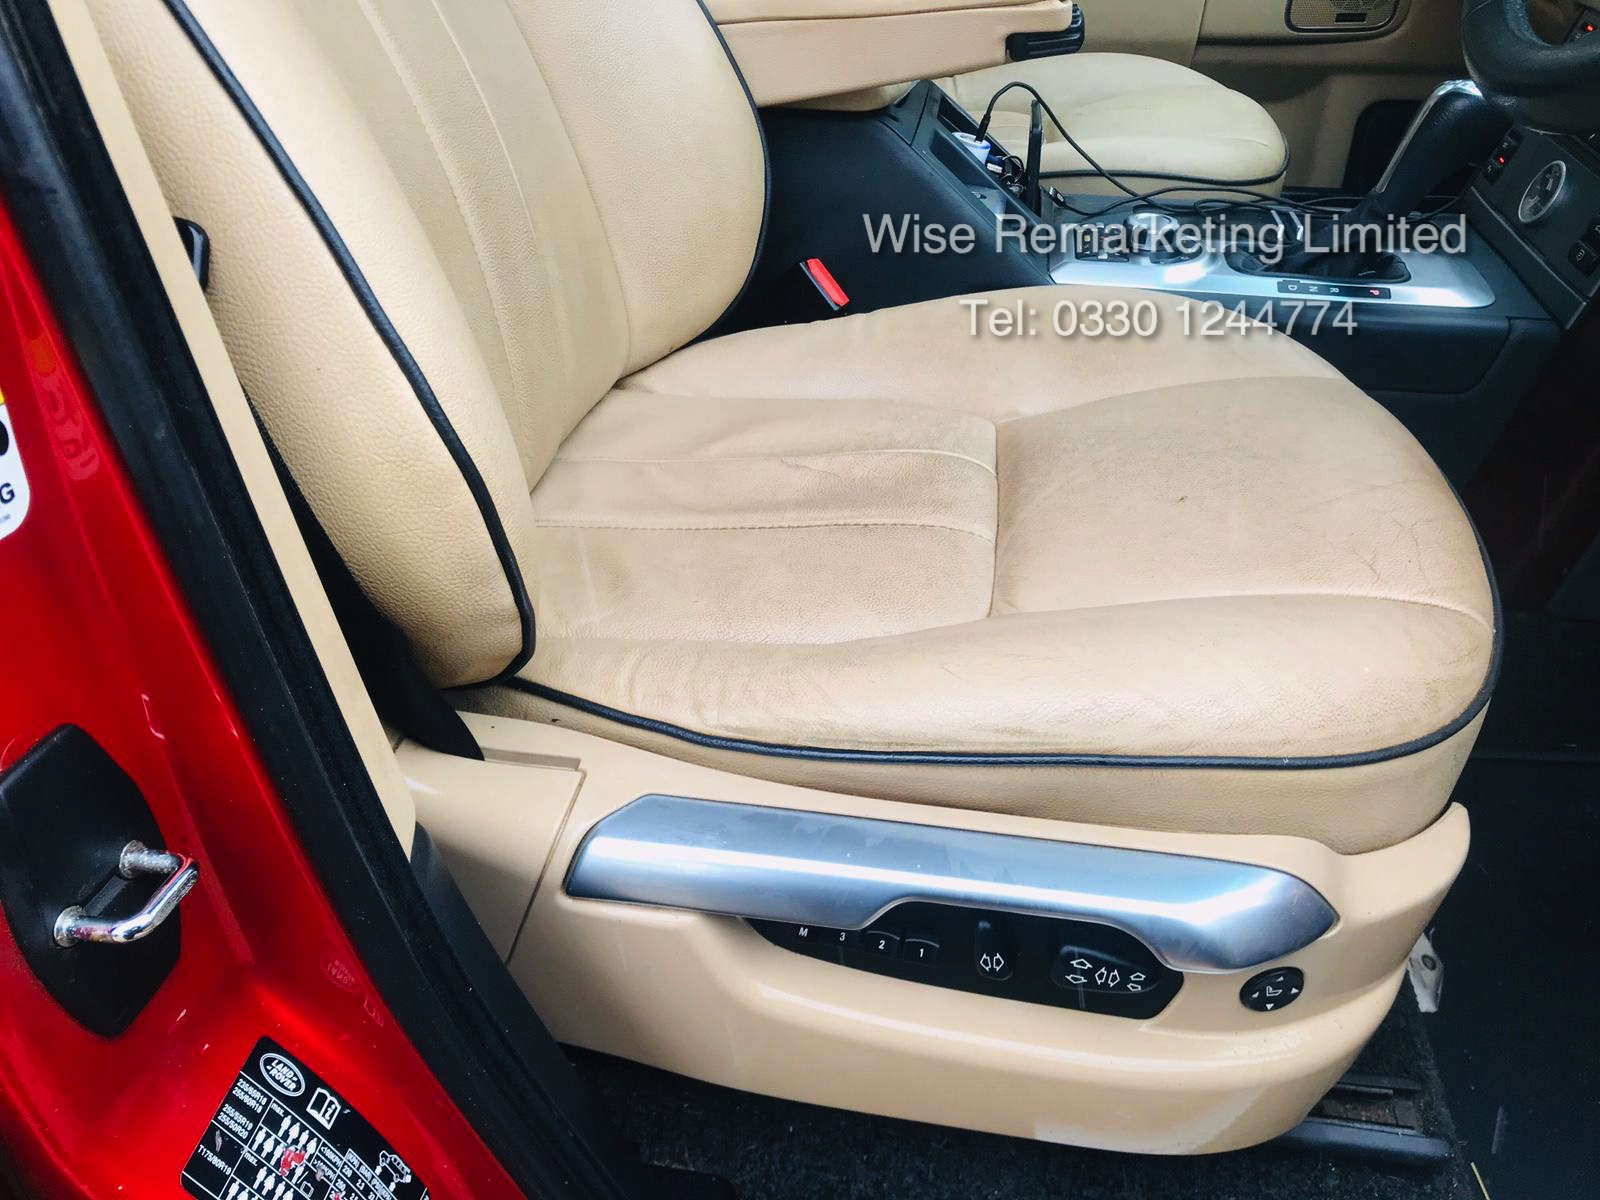 Range Rover Vogue 3.6 TDV8 HSE Auto - 2010 Model - Cream Leather - Service History - - Image 13 of 28